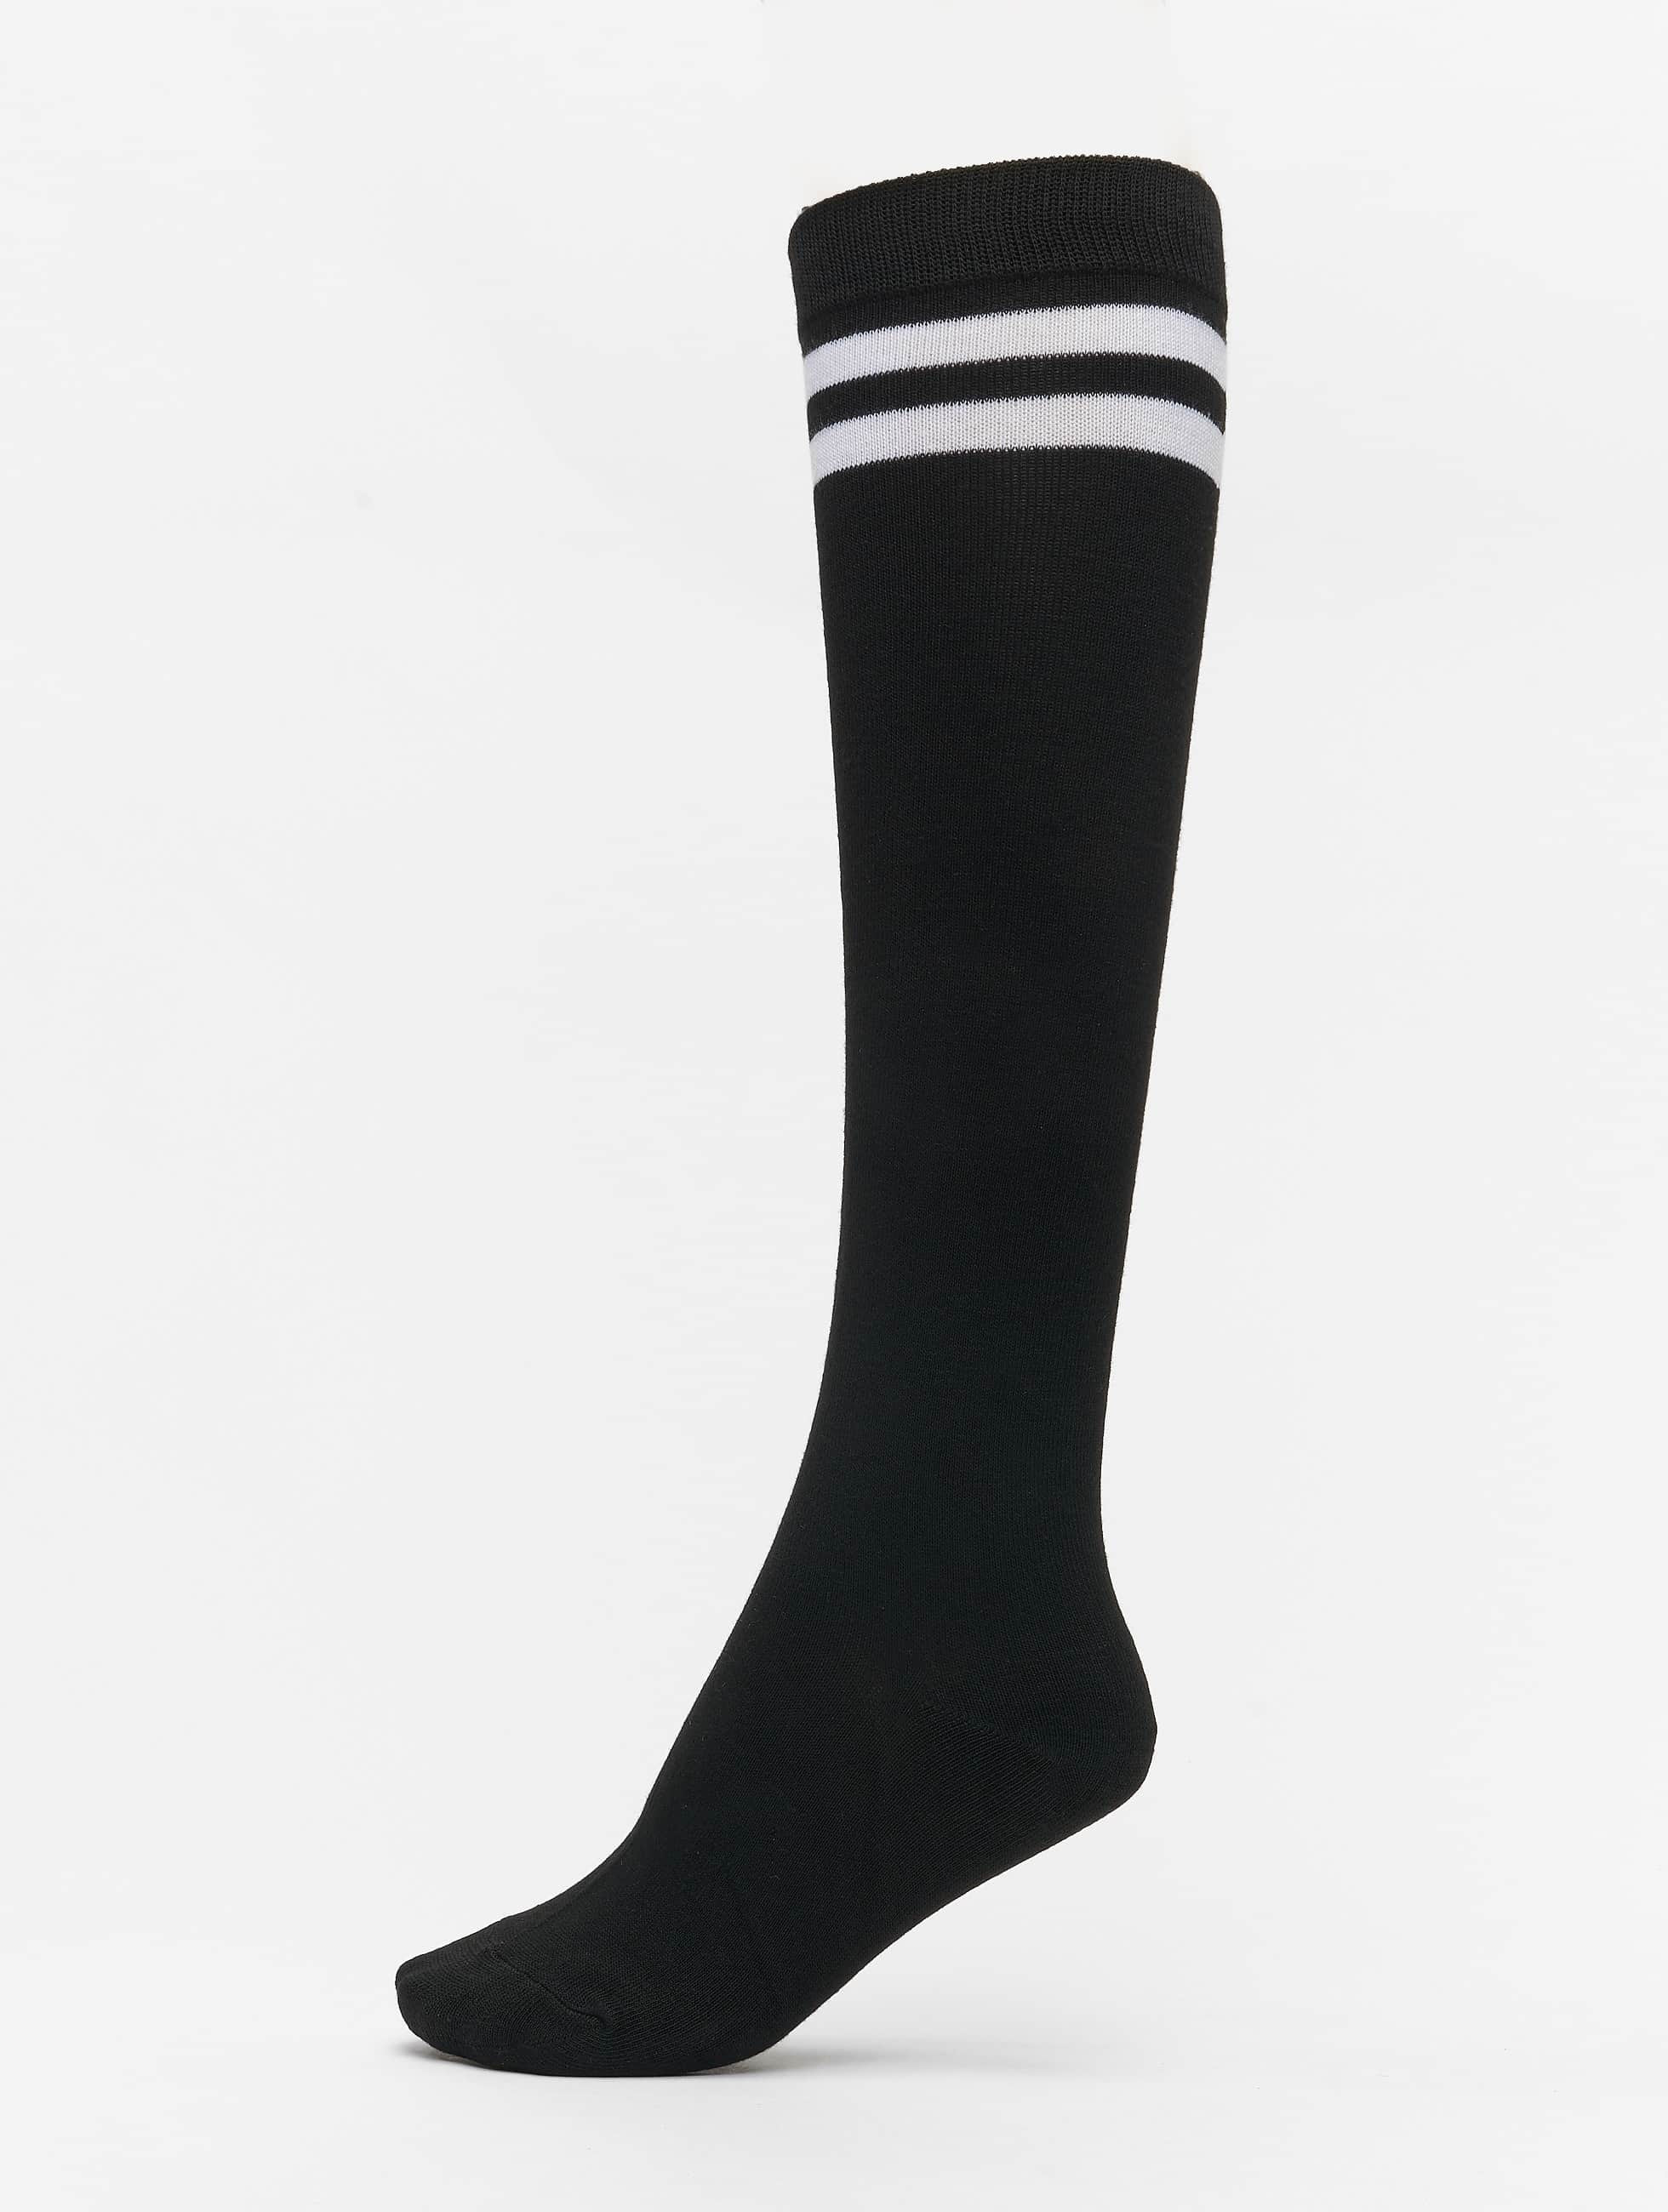 Urban Classics Socken College schwarz